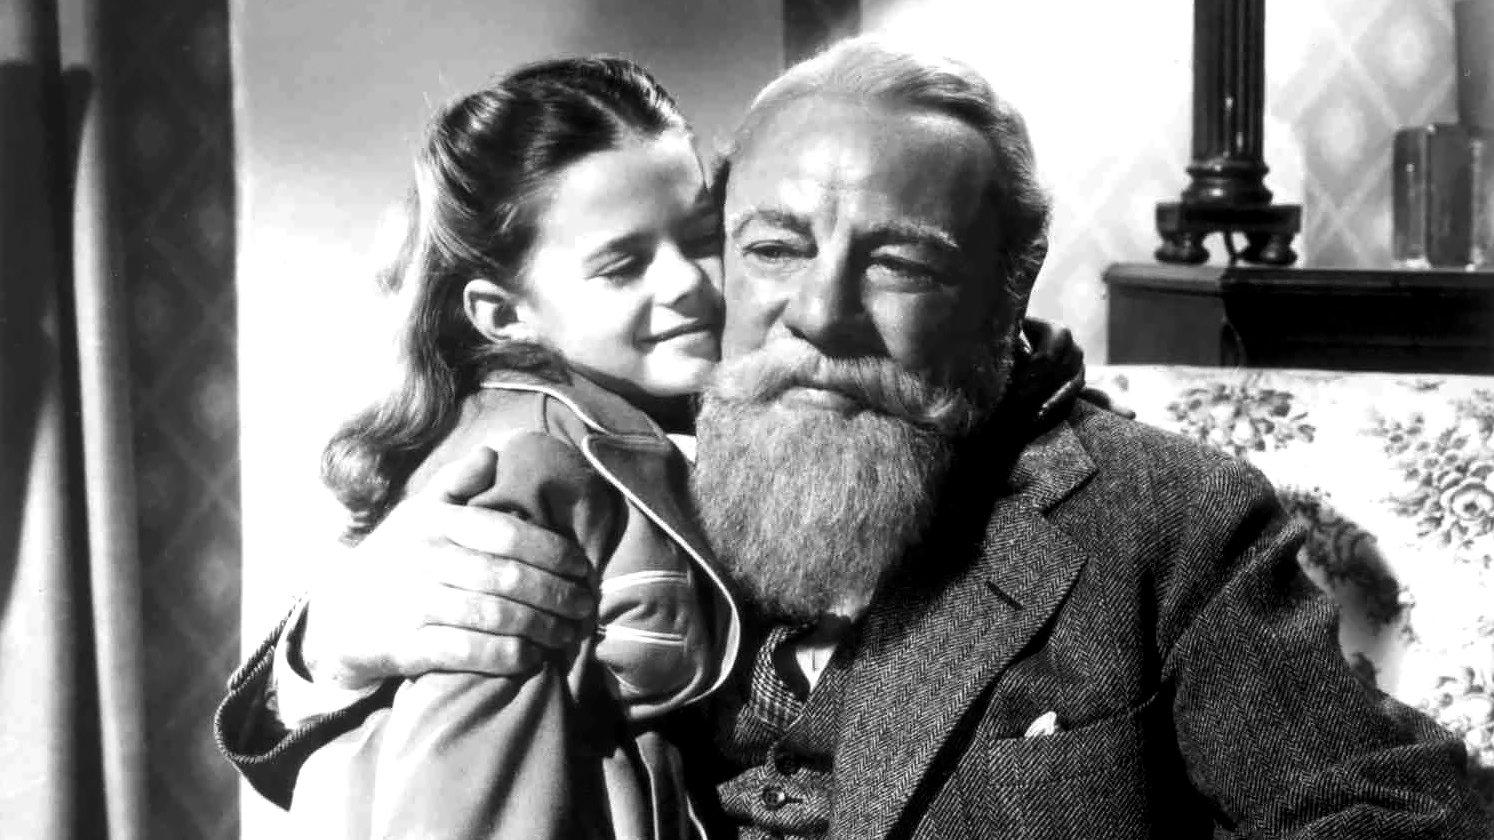 #83) Miracle of 34th Street - (1947 - dir. George Seaton)